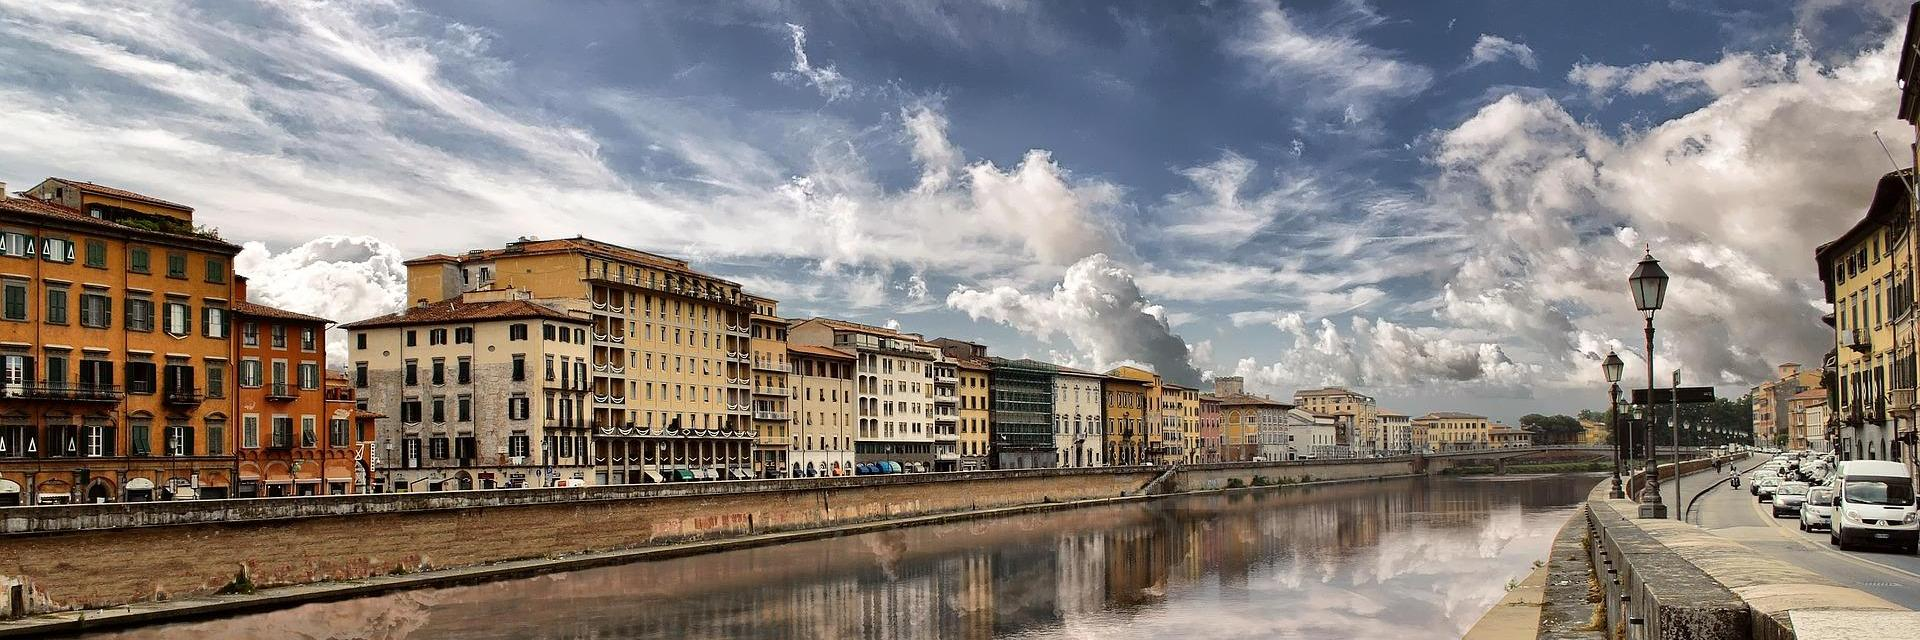 Car Hire Pisa Airport Best Car Rental Deals In Pisa Synergy Car Hire